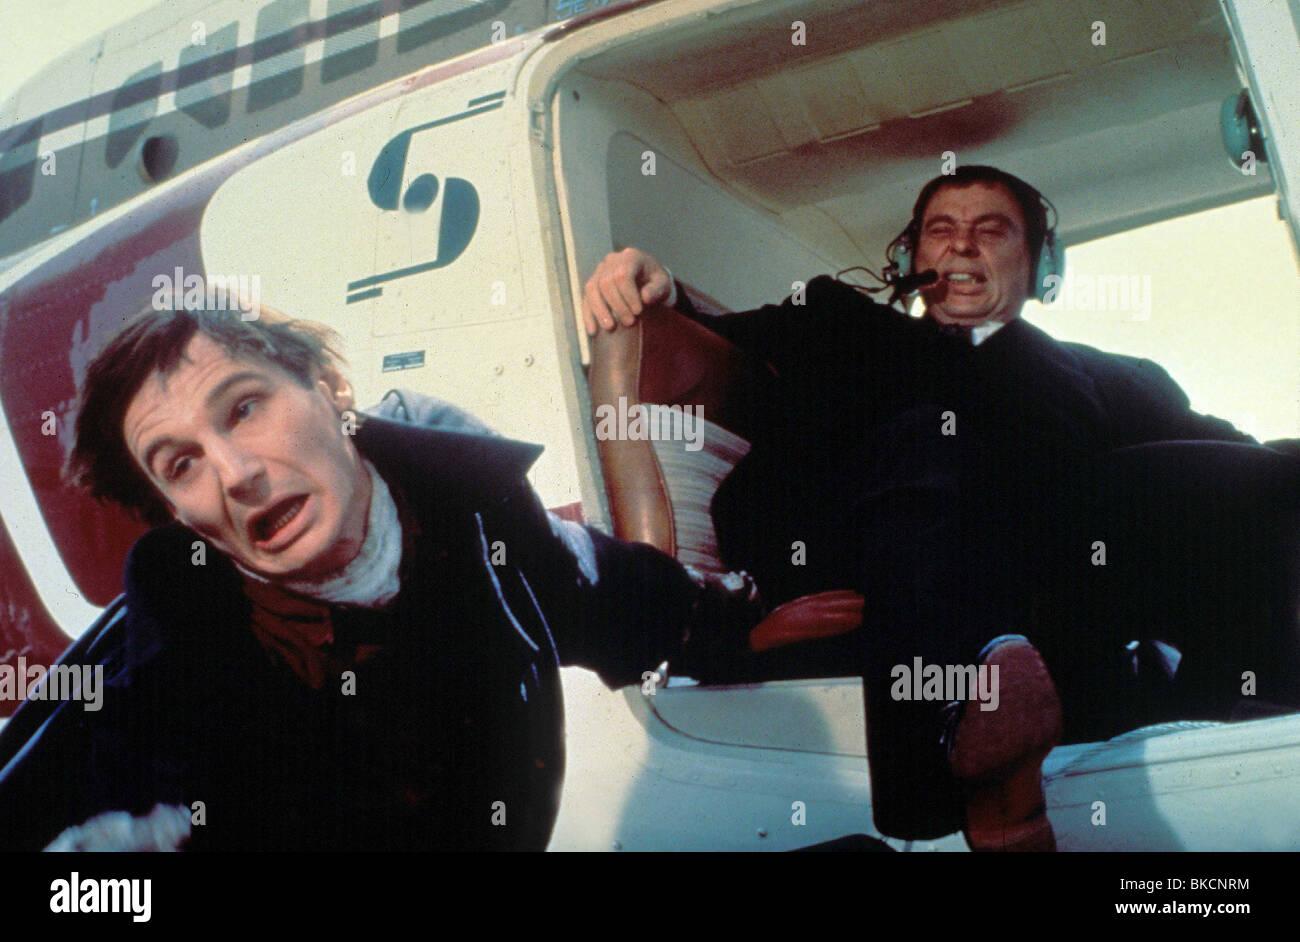 DARKMAN (1990) LIAM NEESON, LARRY DRAKE DRK 006 - Stock Image